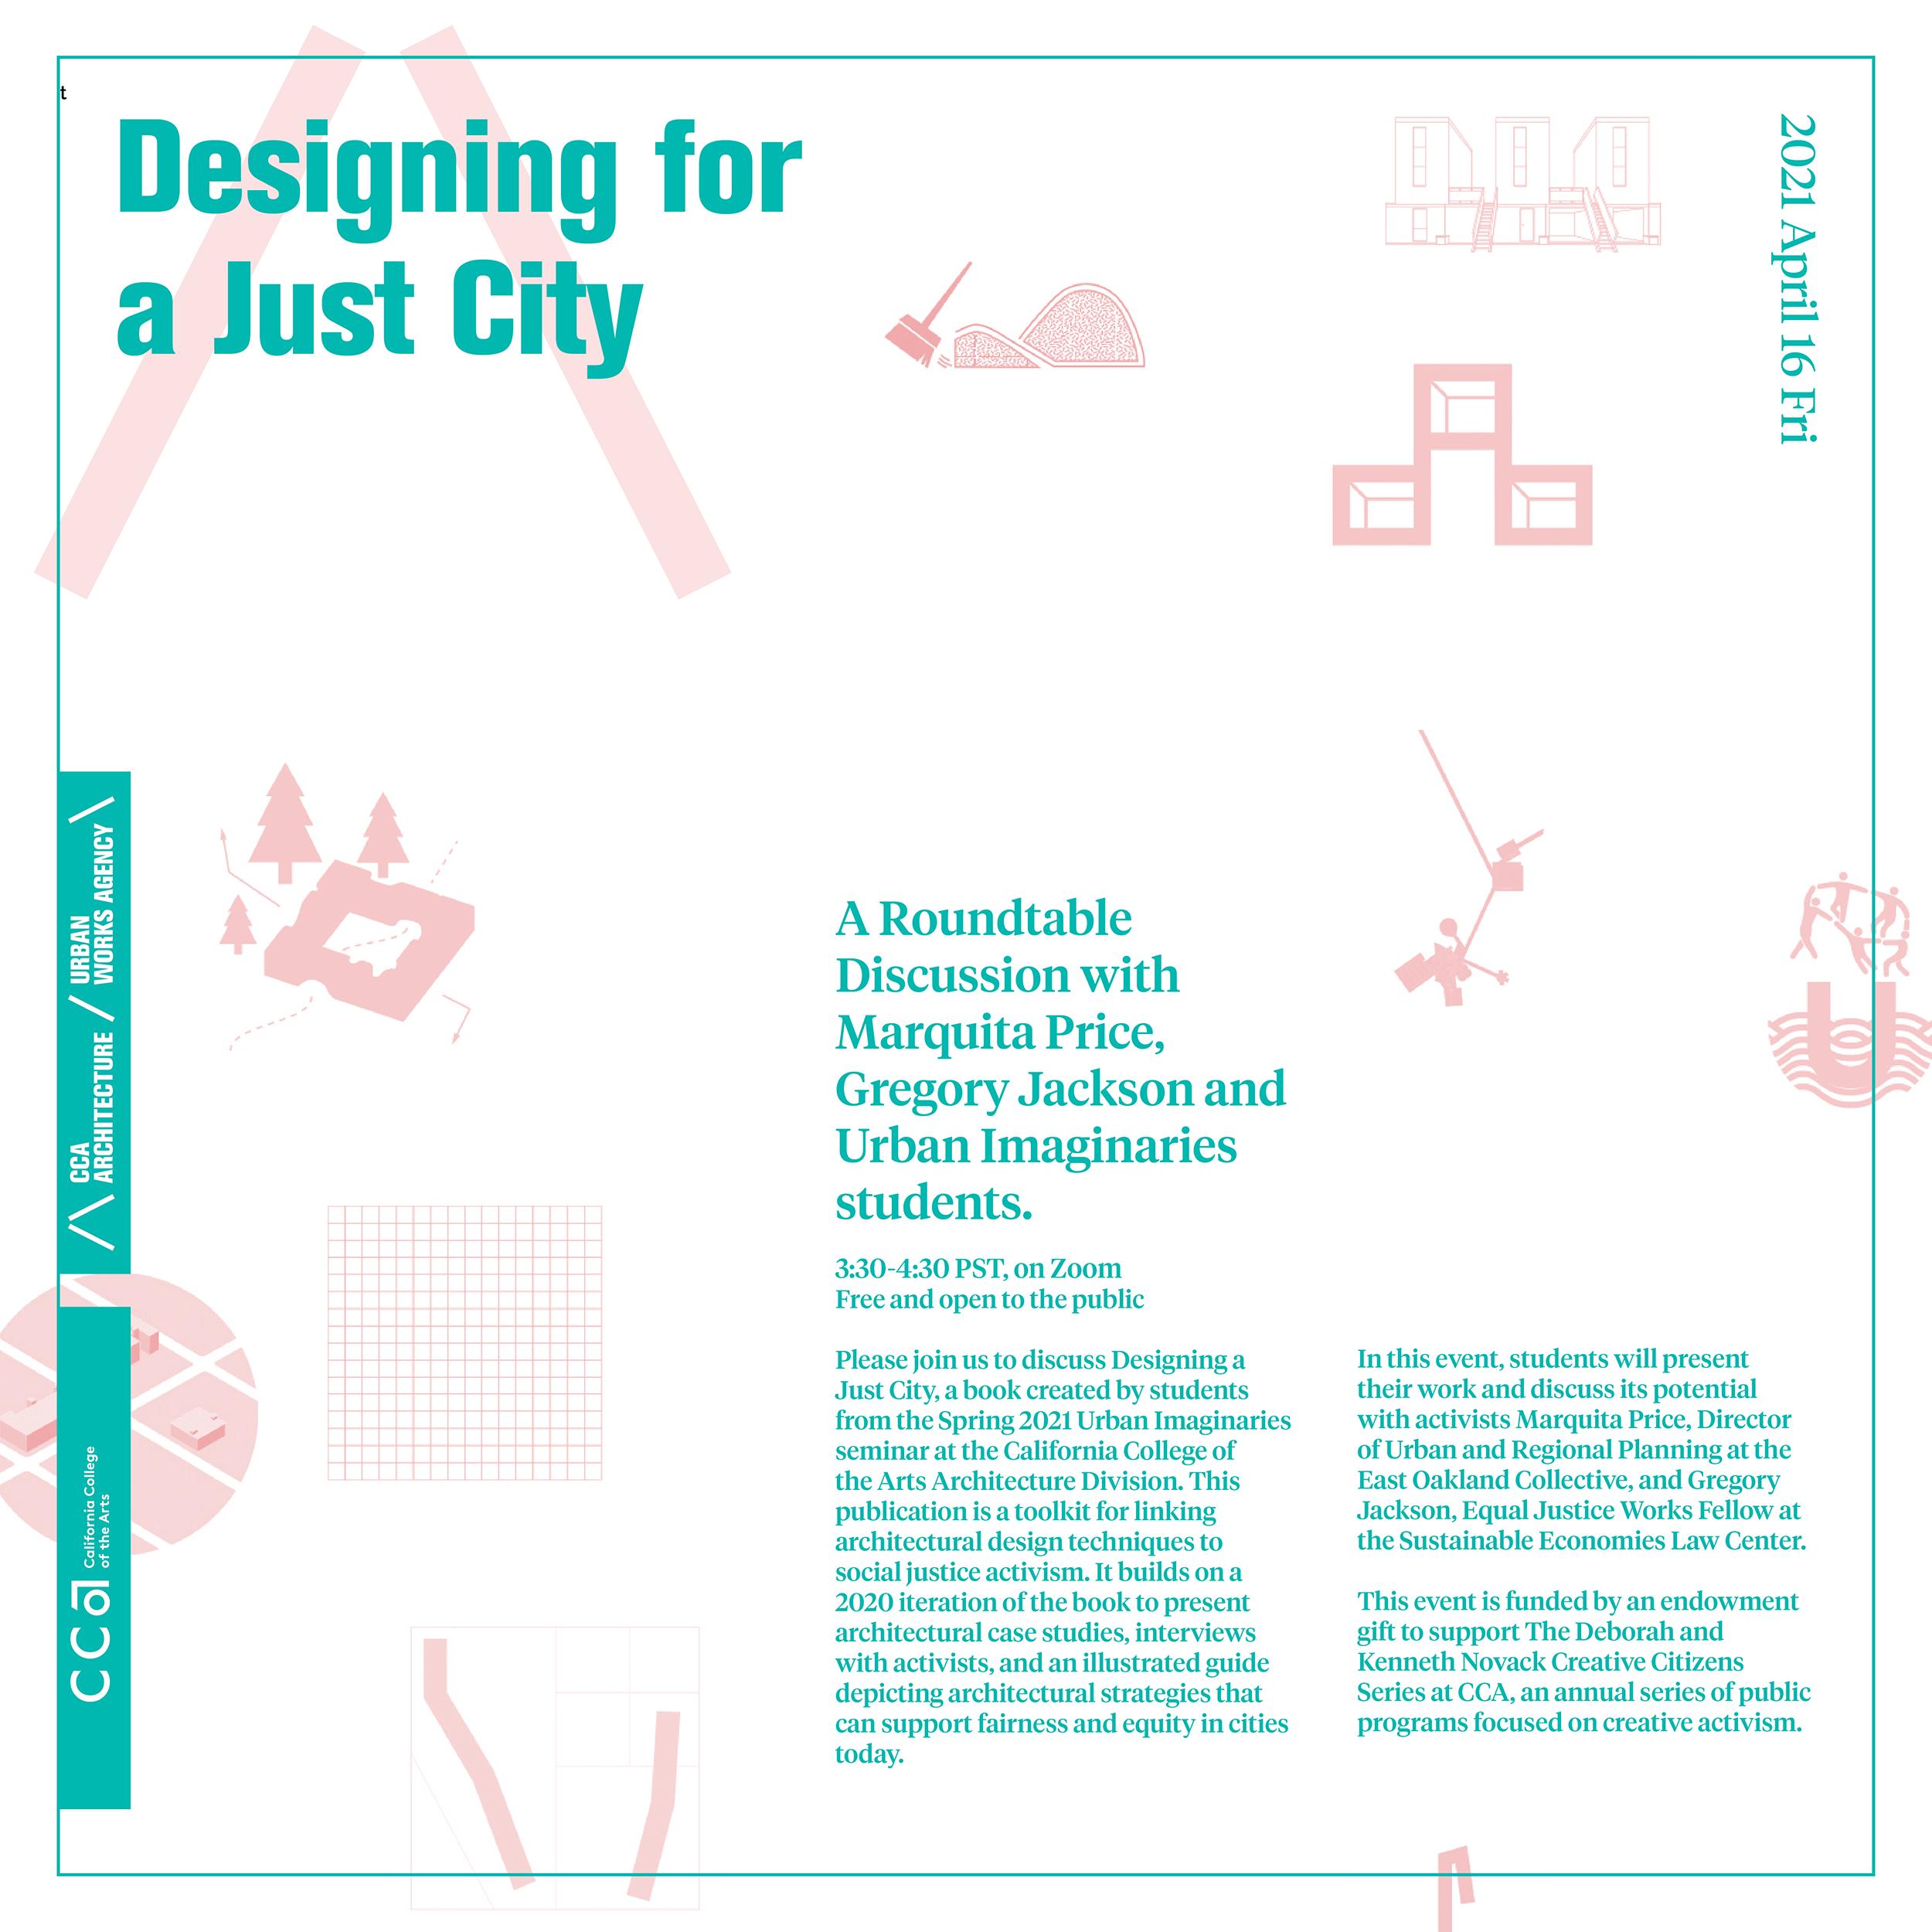 UrbanEconomics_CCAatCCA_DesigningaJustCity_resized.png